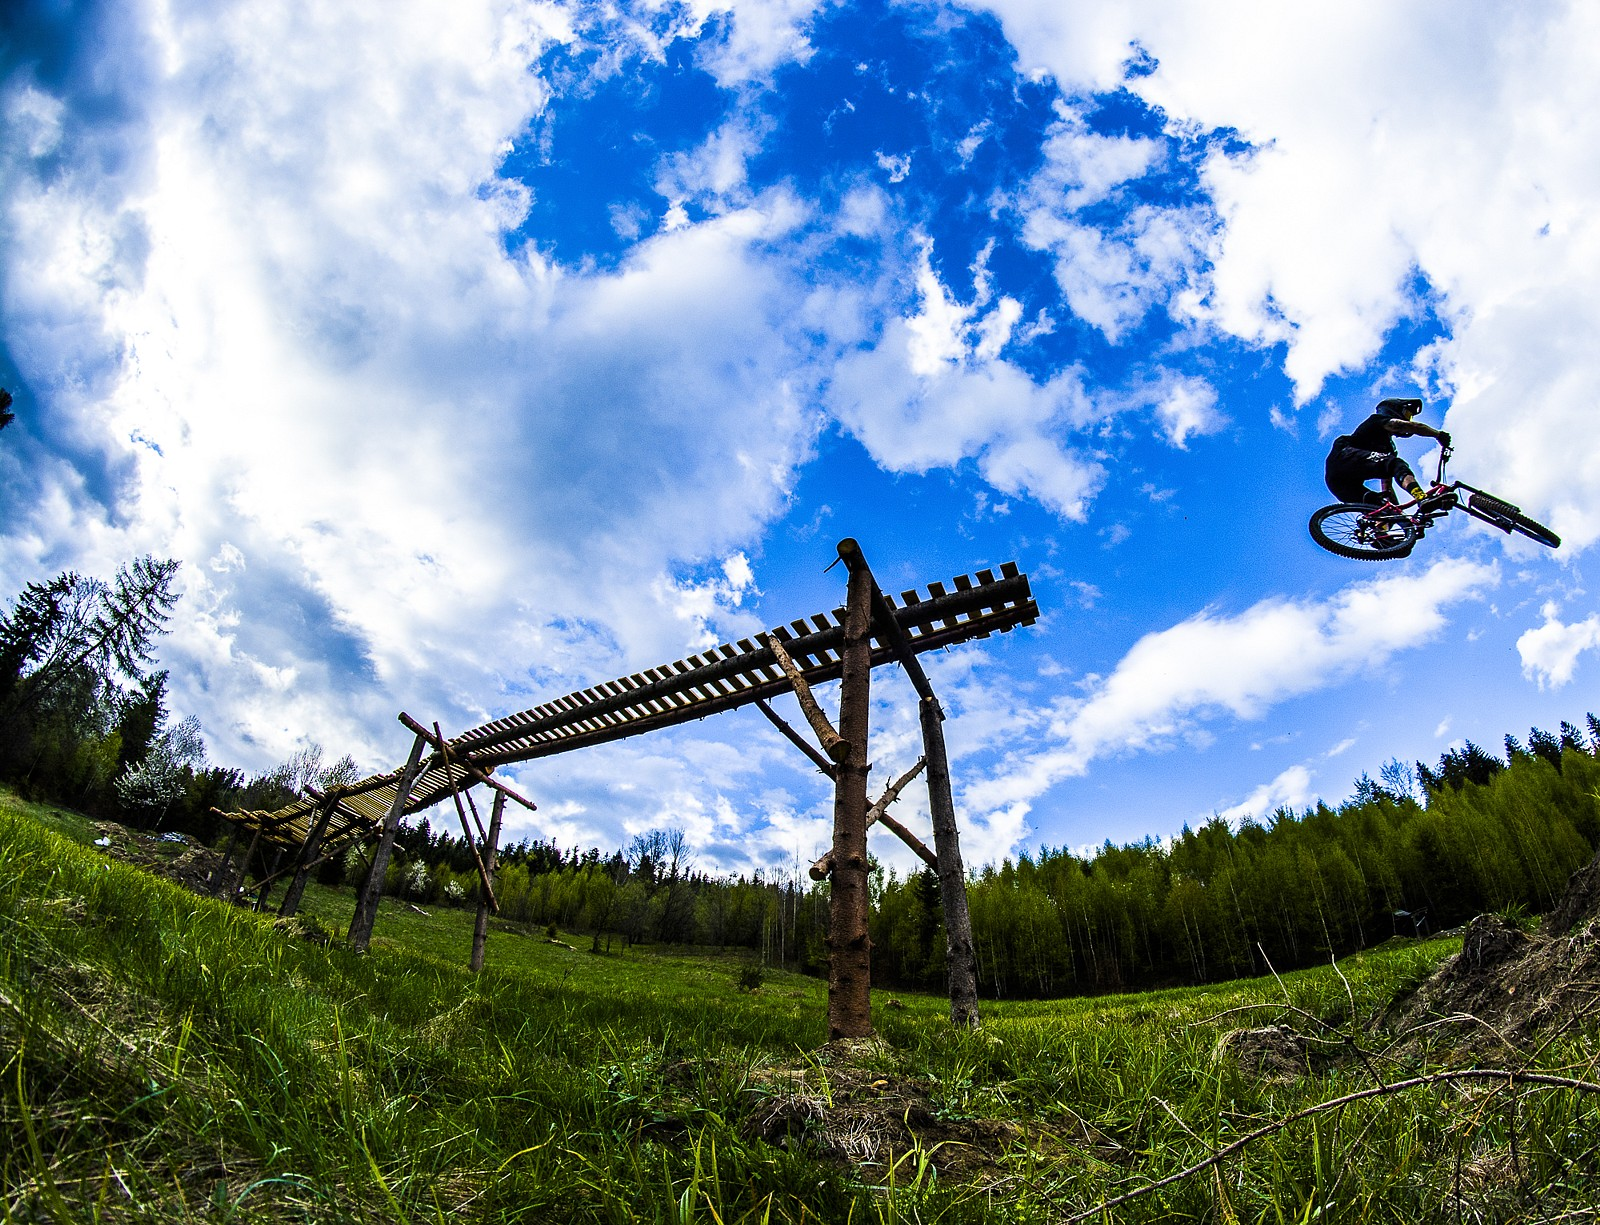 test ride - Banan - Mountain Biking Pictures - Vital MTB